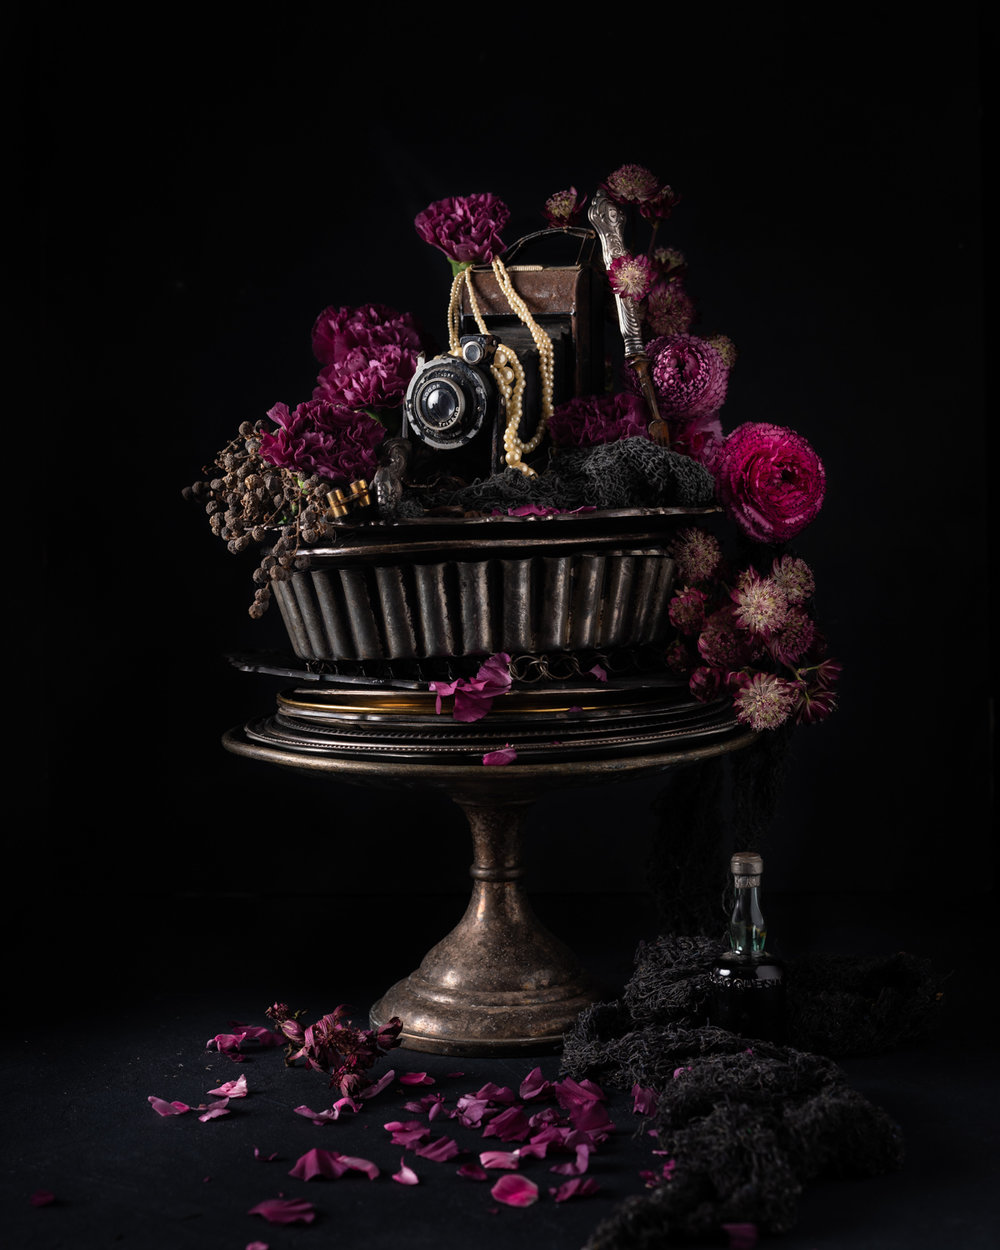 Kodak flowers mats dreyer fotograf artprint stylist interior blomster oslo norge fujifilm